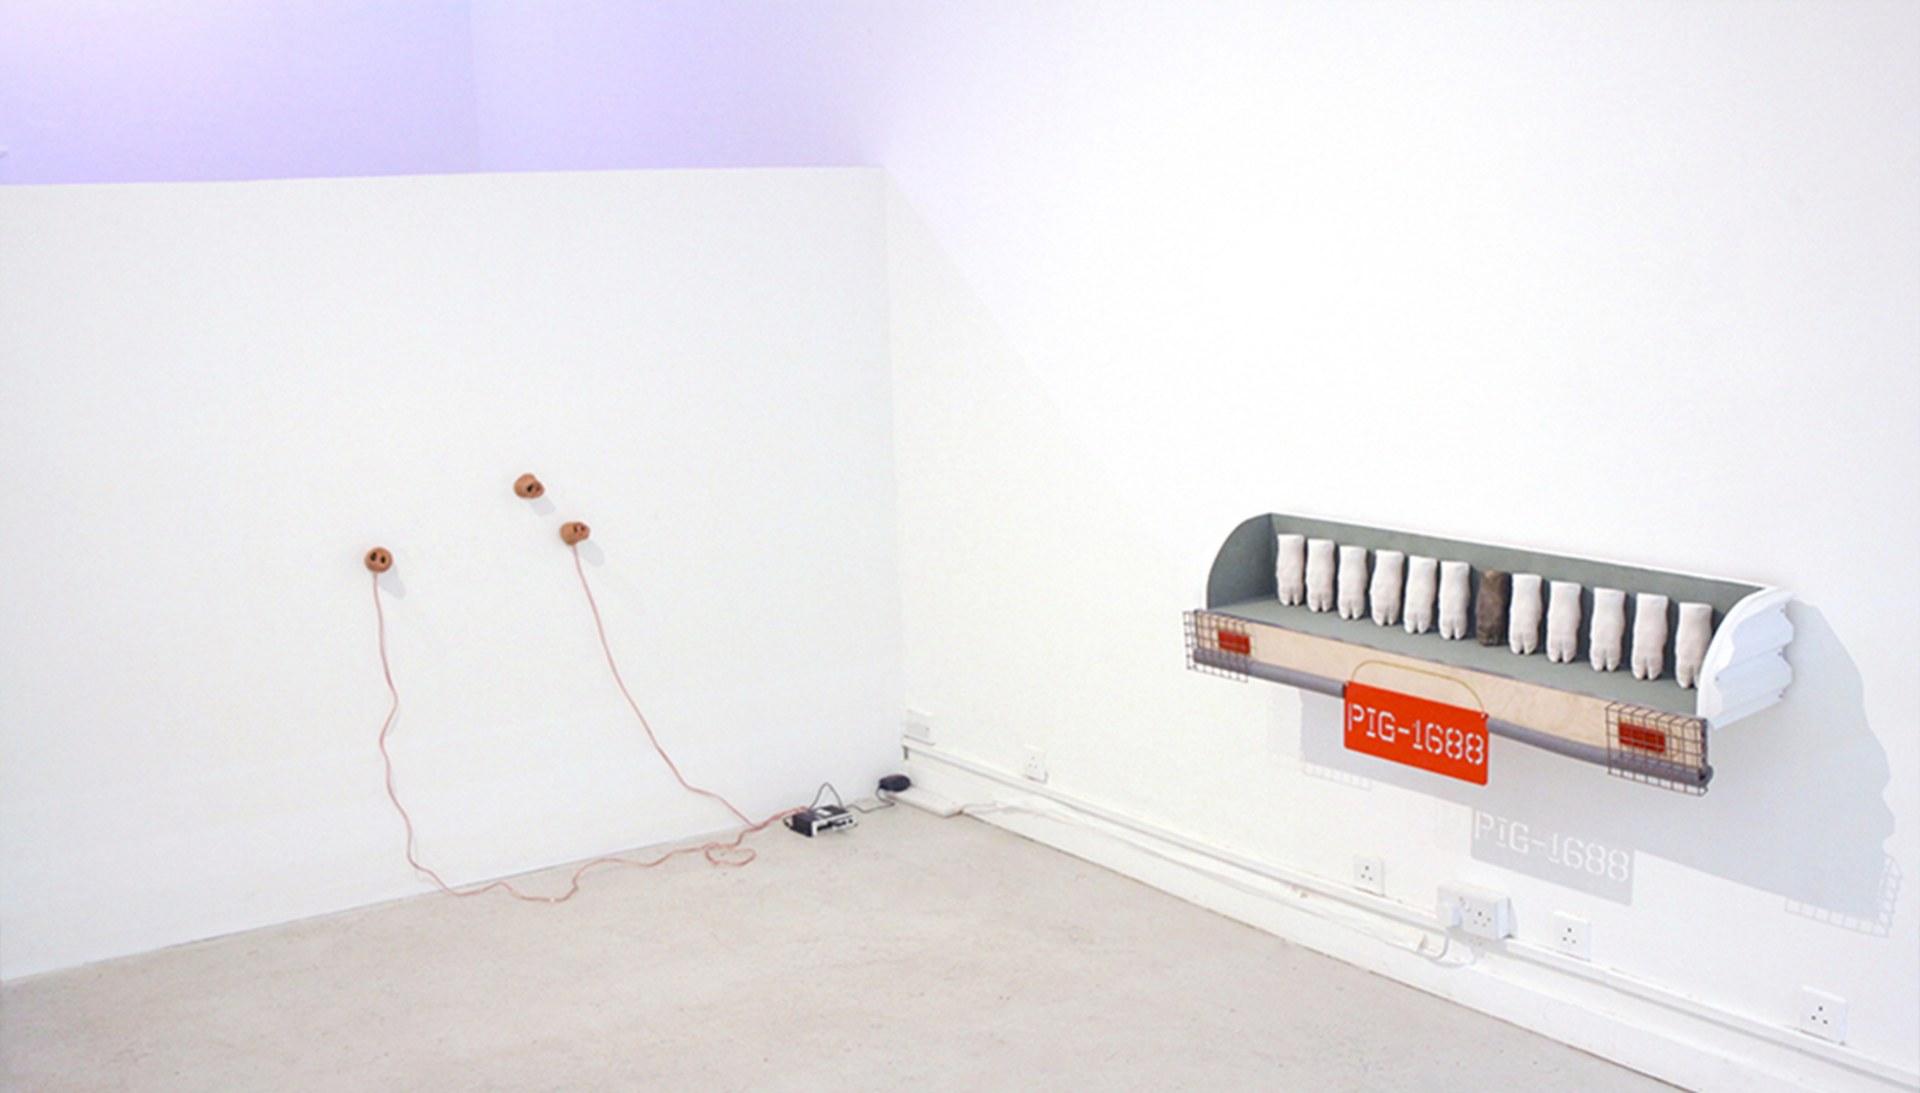 Installation view at Peak Gallery